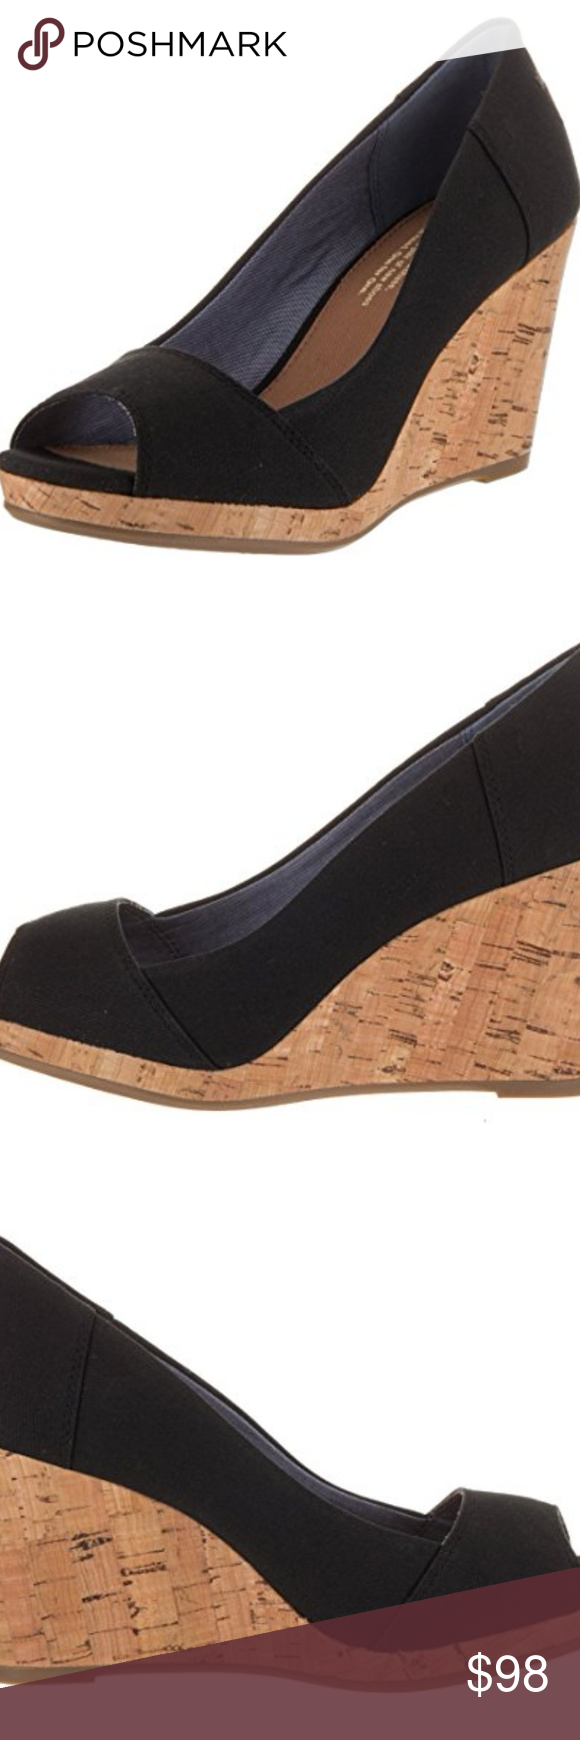 460449d0d77 Toms Women s Stella Wedge Black Canvas Casual Shoe canvas Cork heel